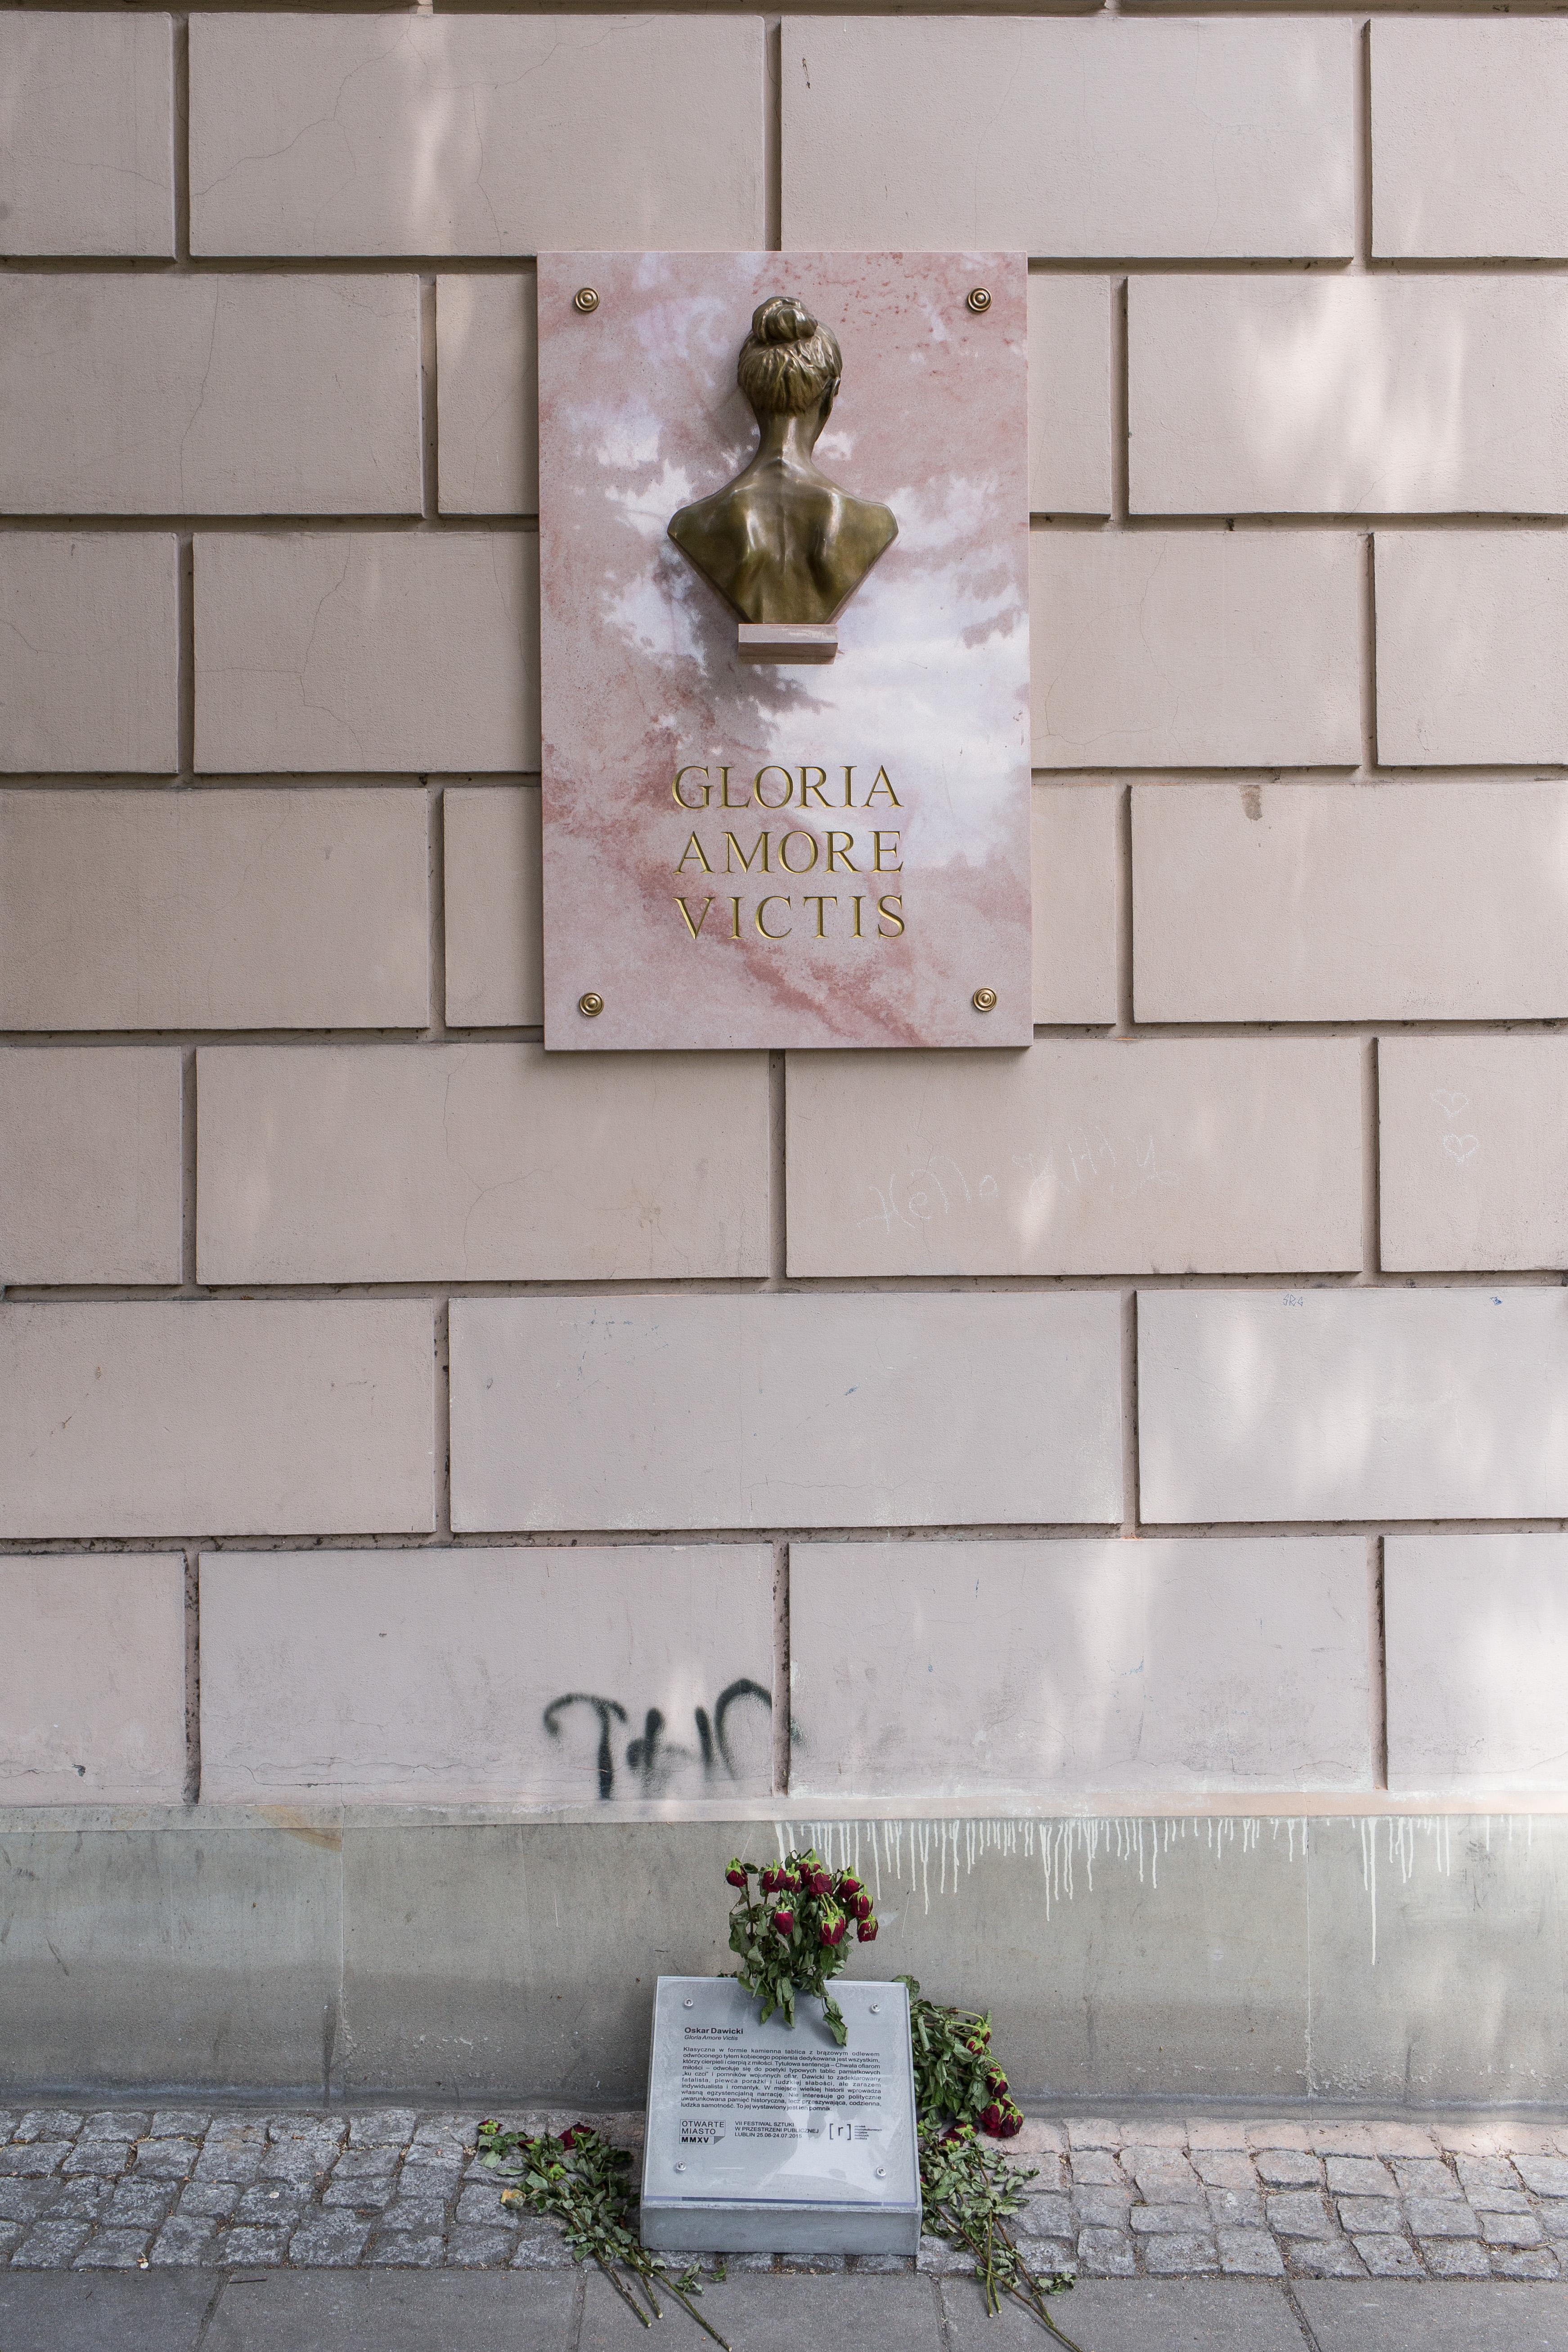 Oskar Dawicki, Gloria Amore Victis, fot.Tomasz Kulbowski